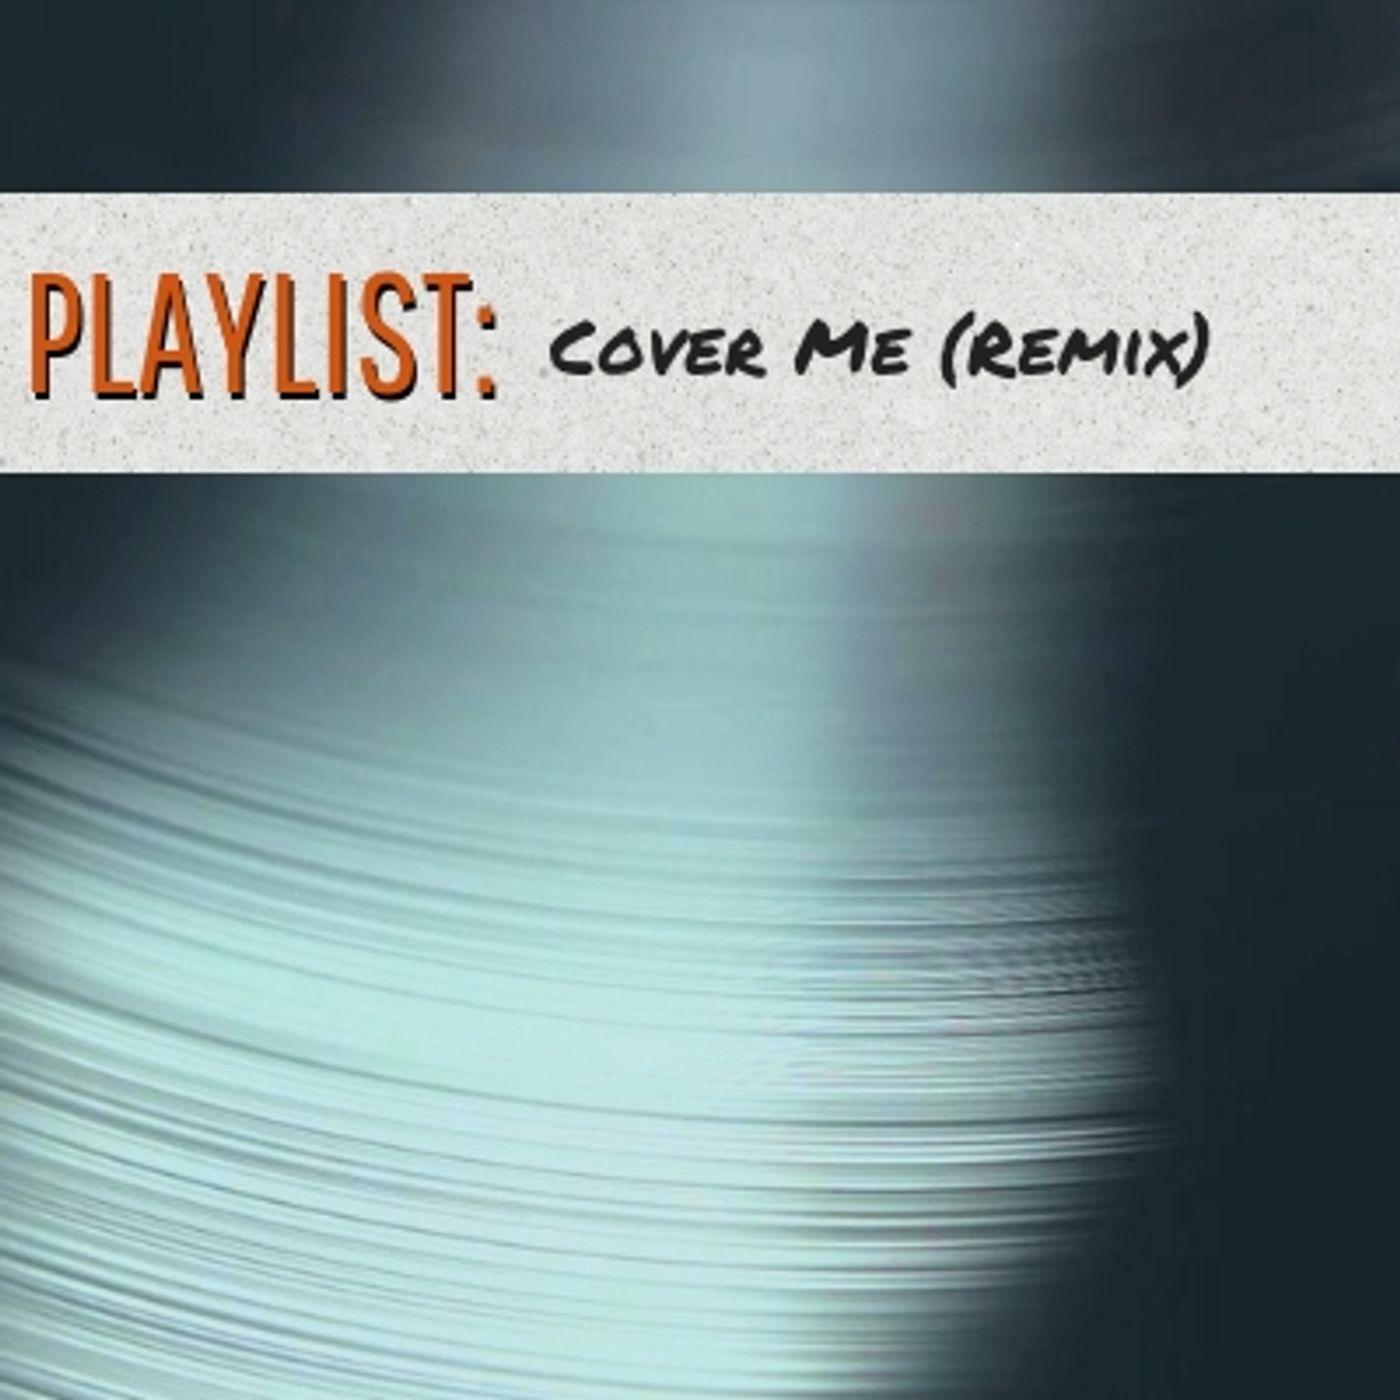 4.10 Cover Me (Remix)